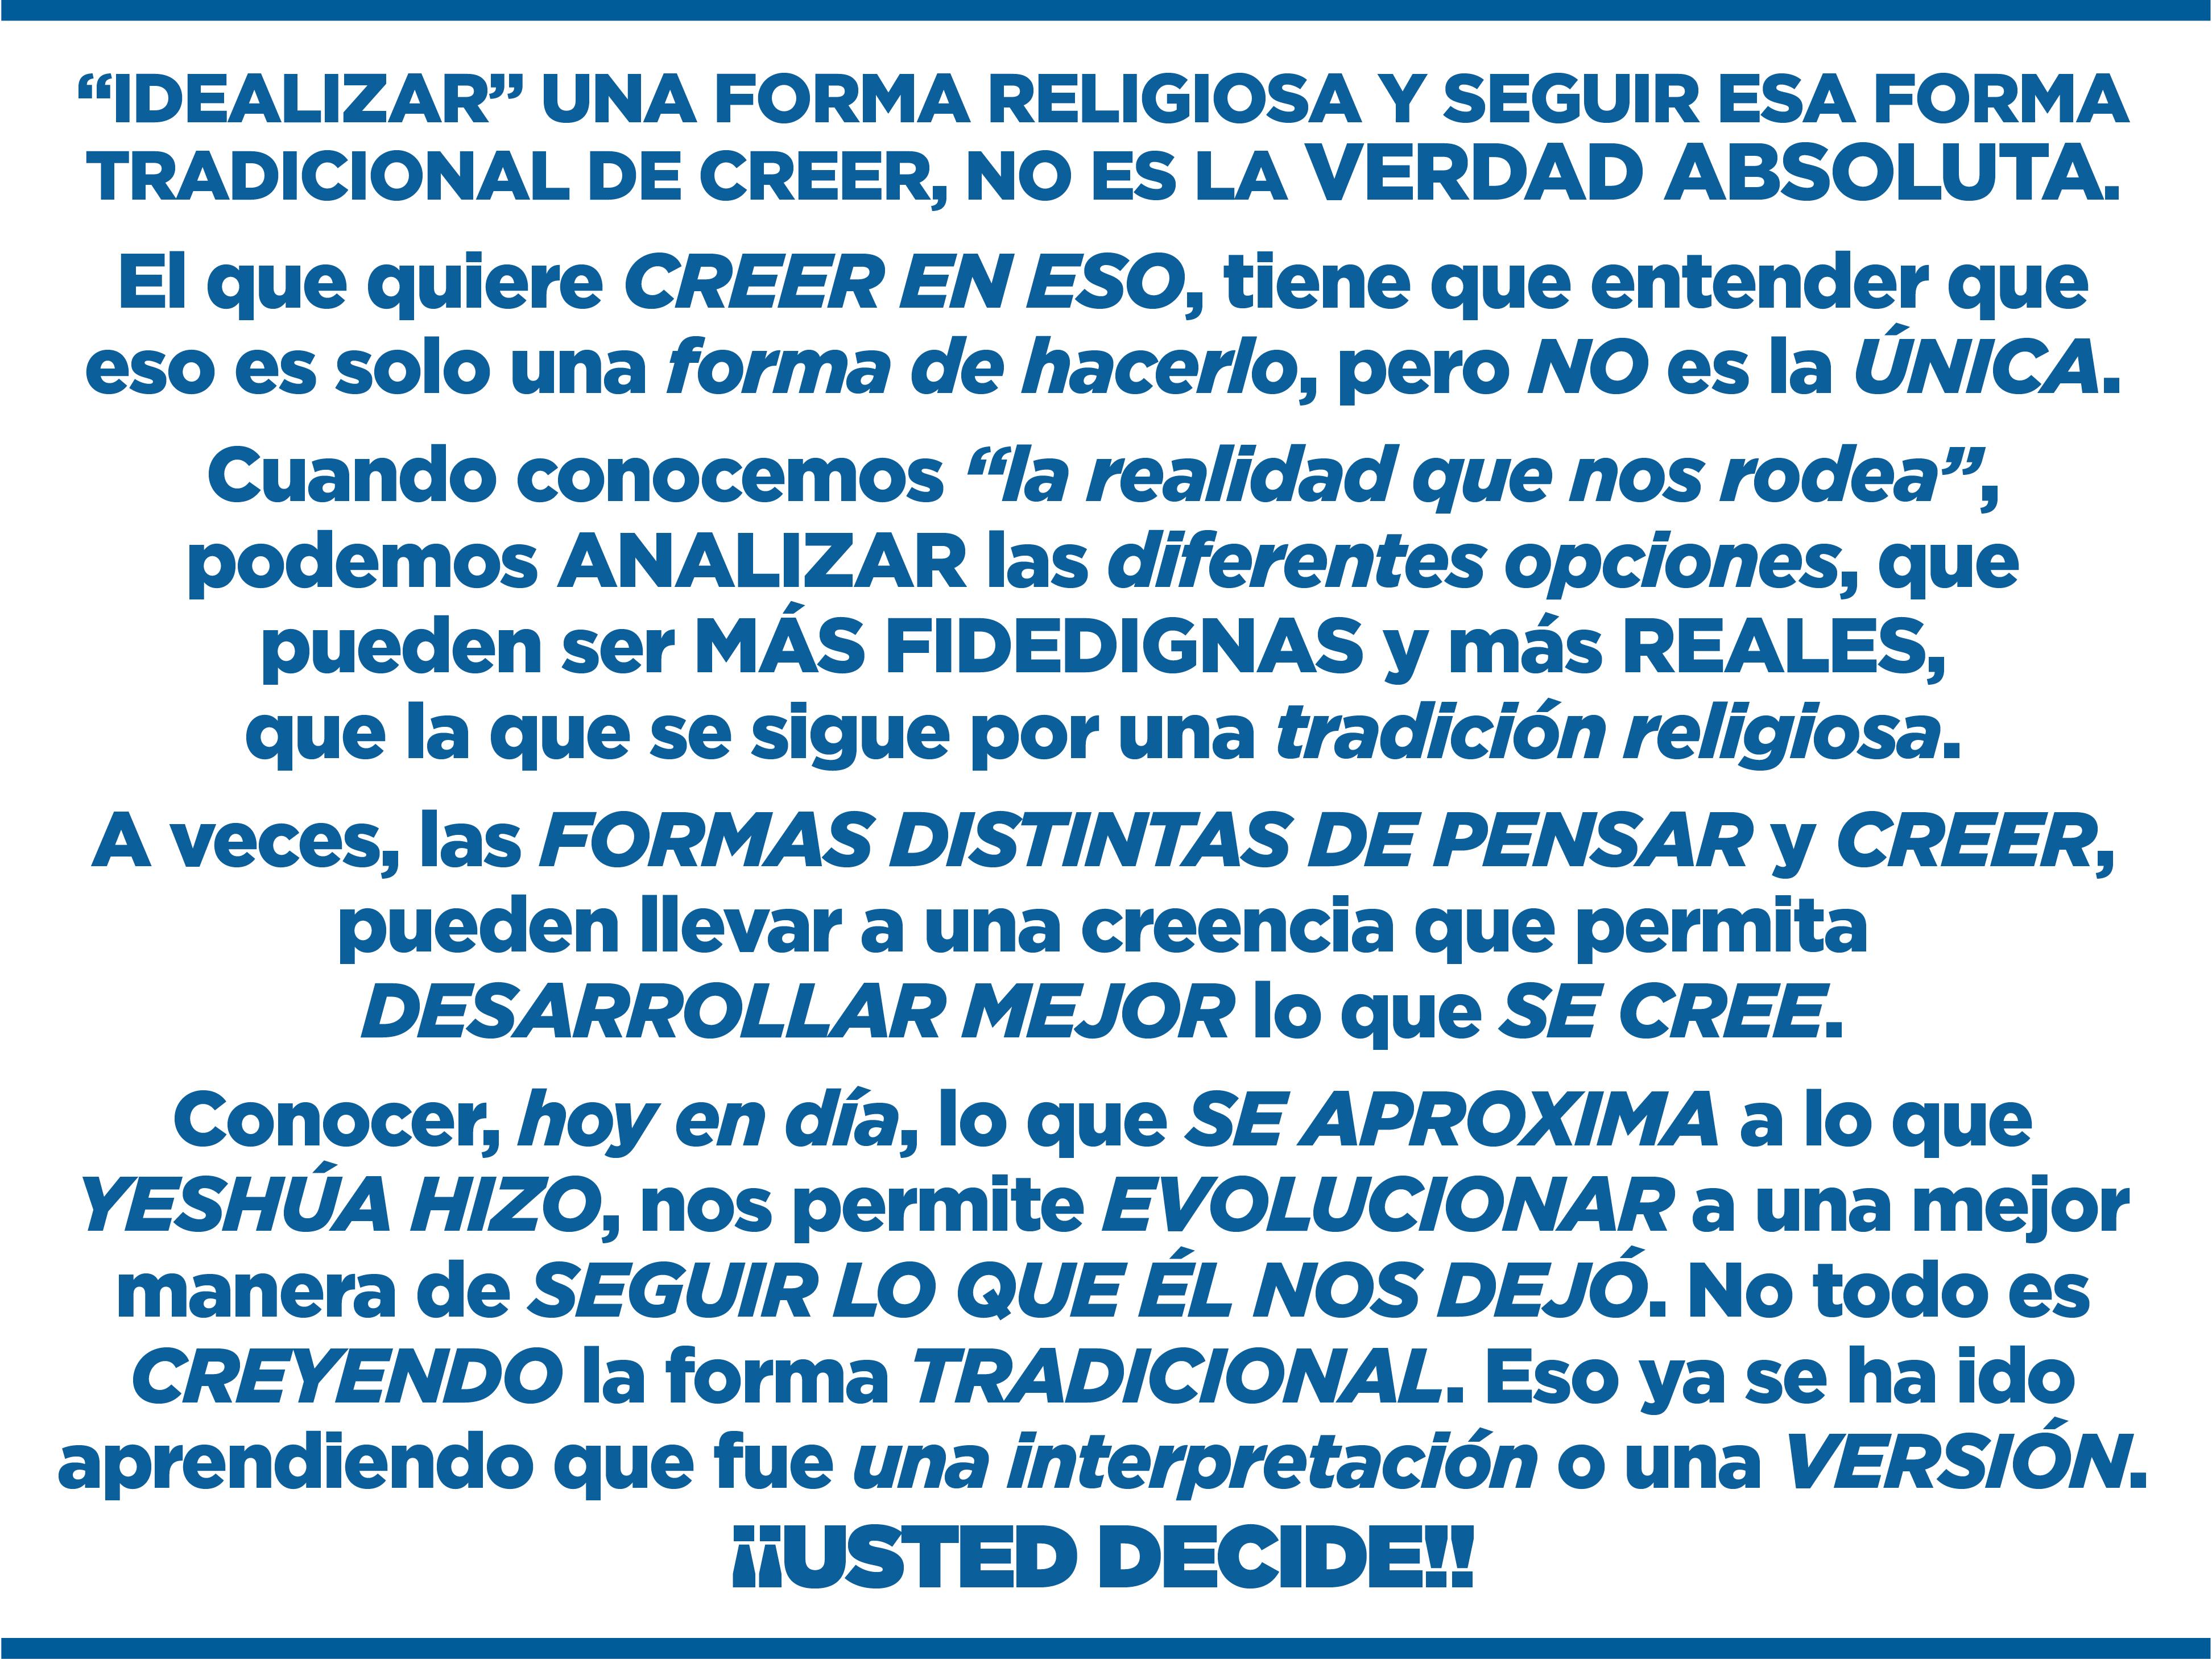 BANNER IDEALIZAR_RELIGION